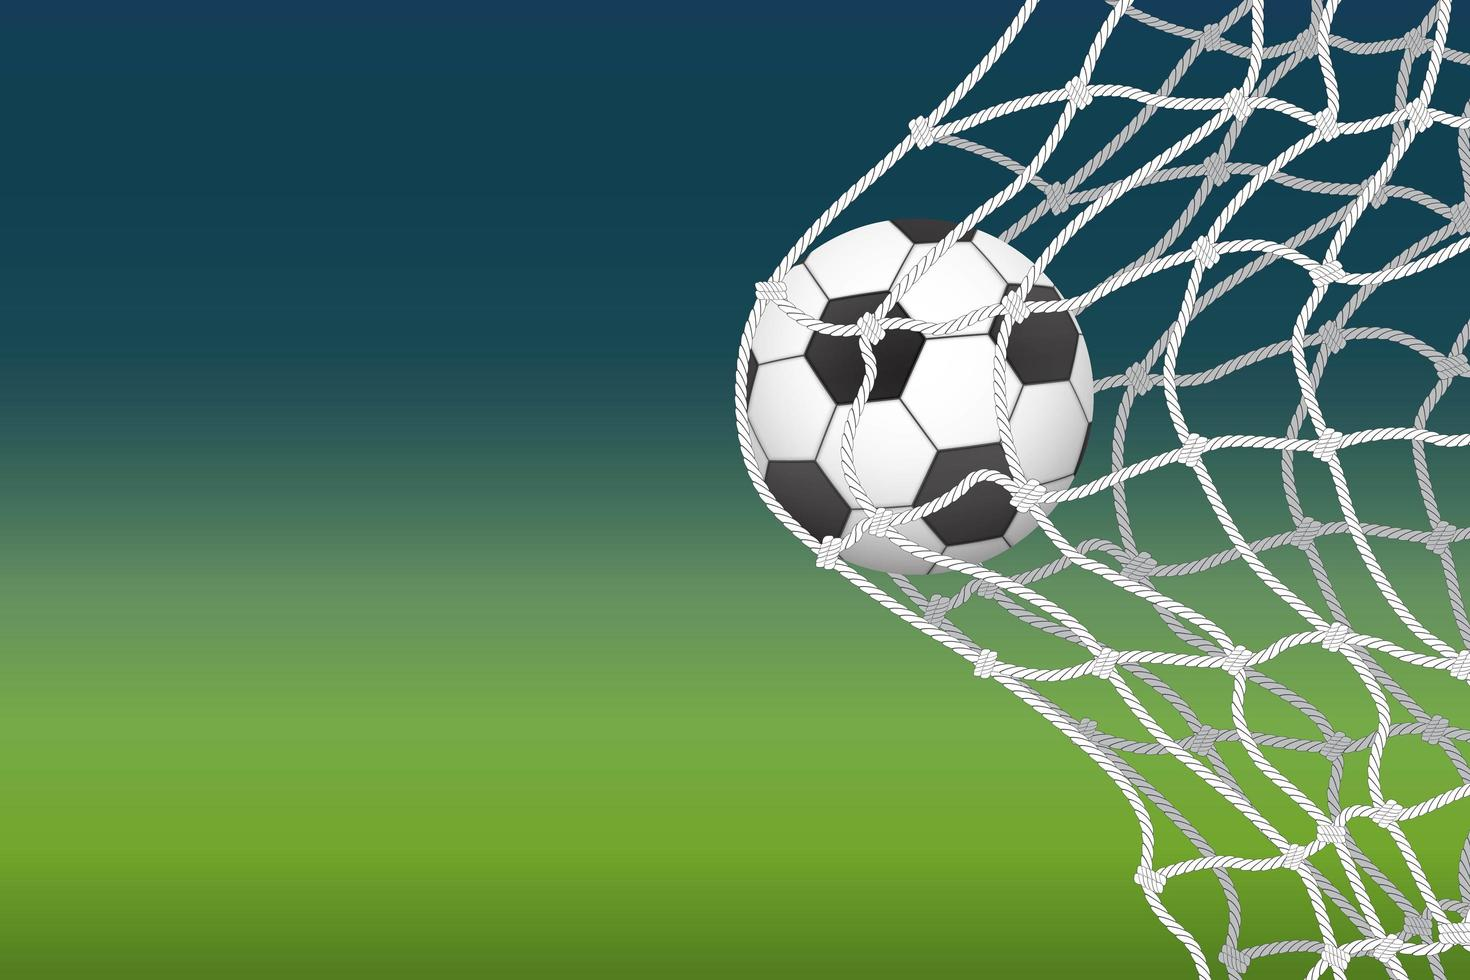 Fußball geht ins Netz vektor